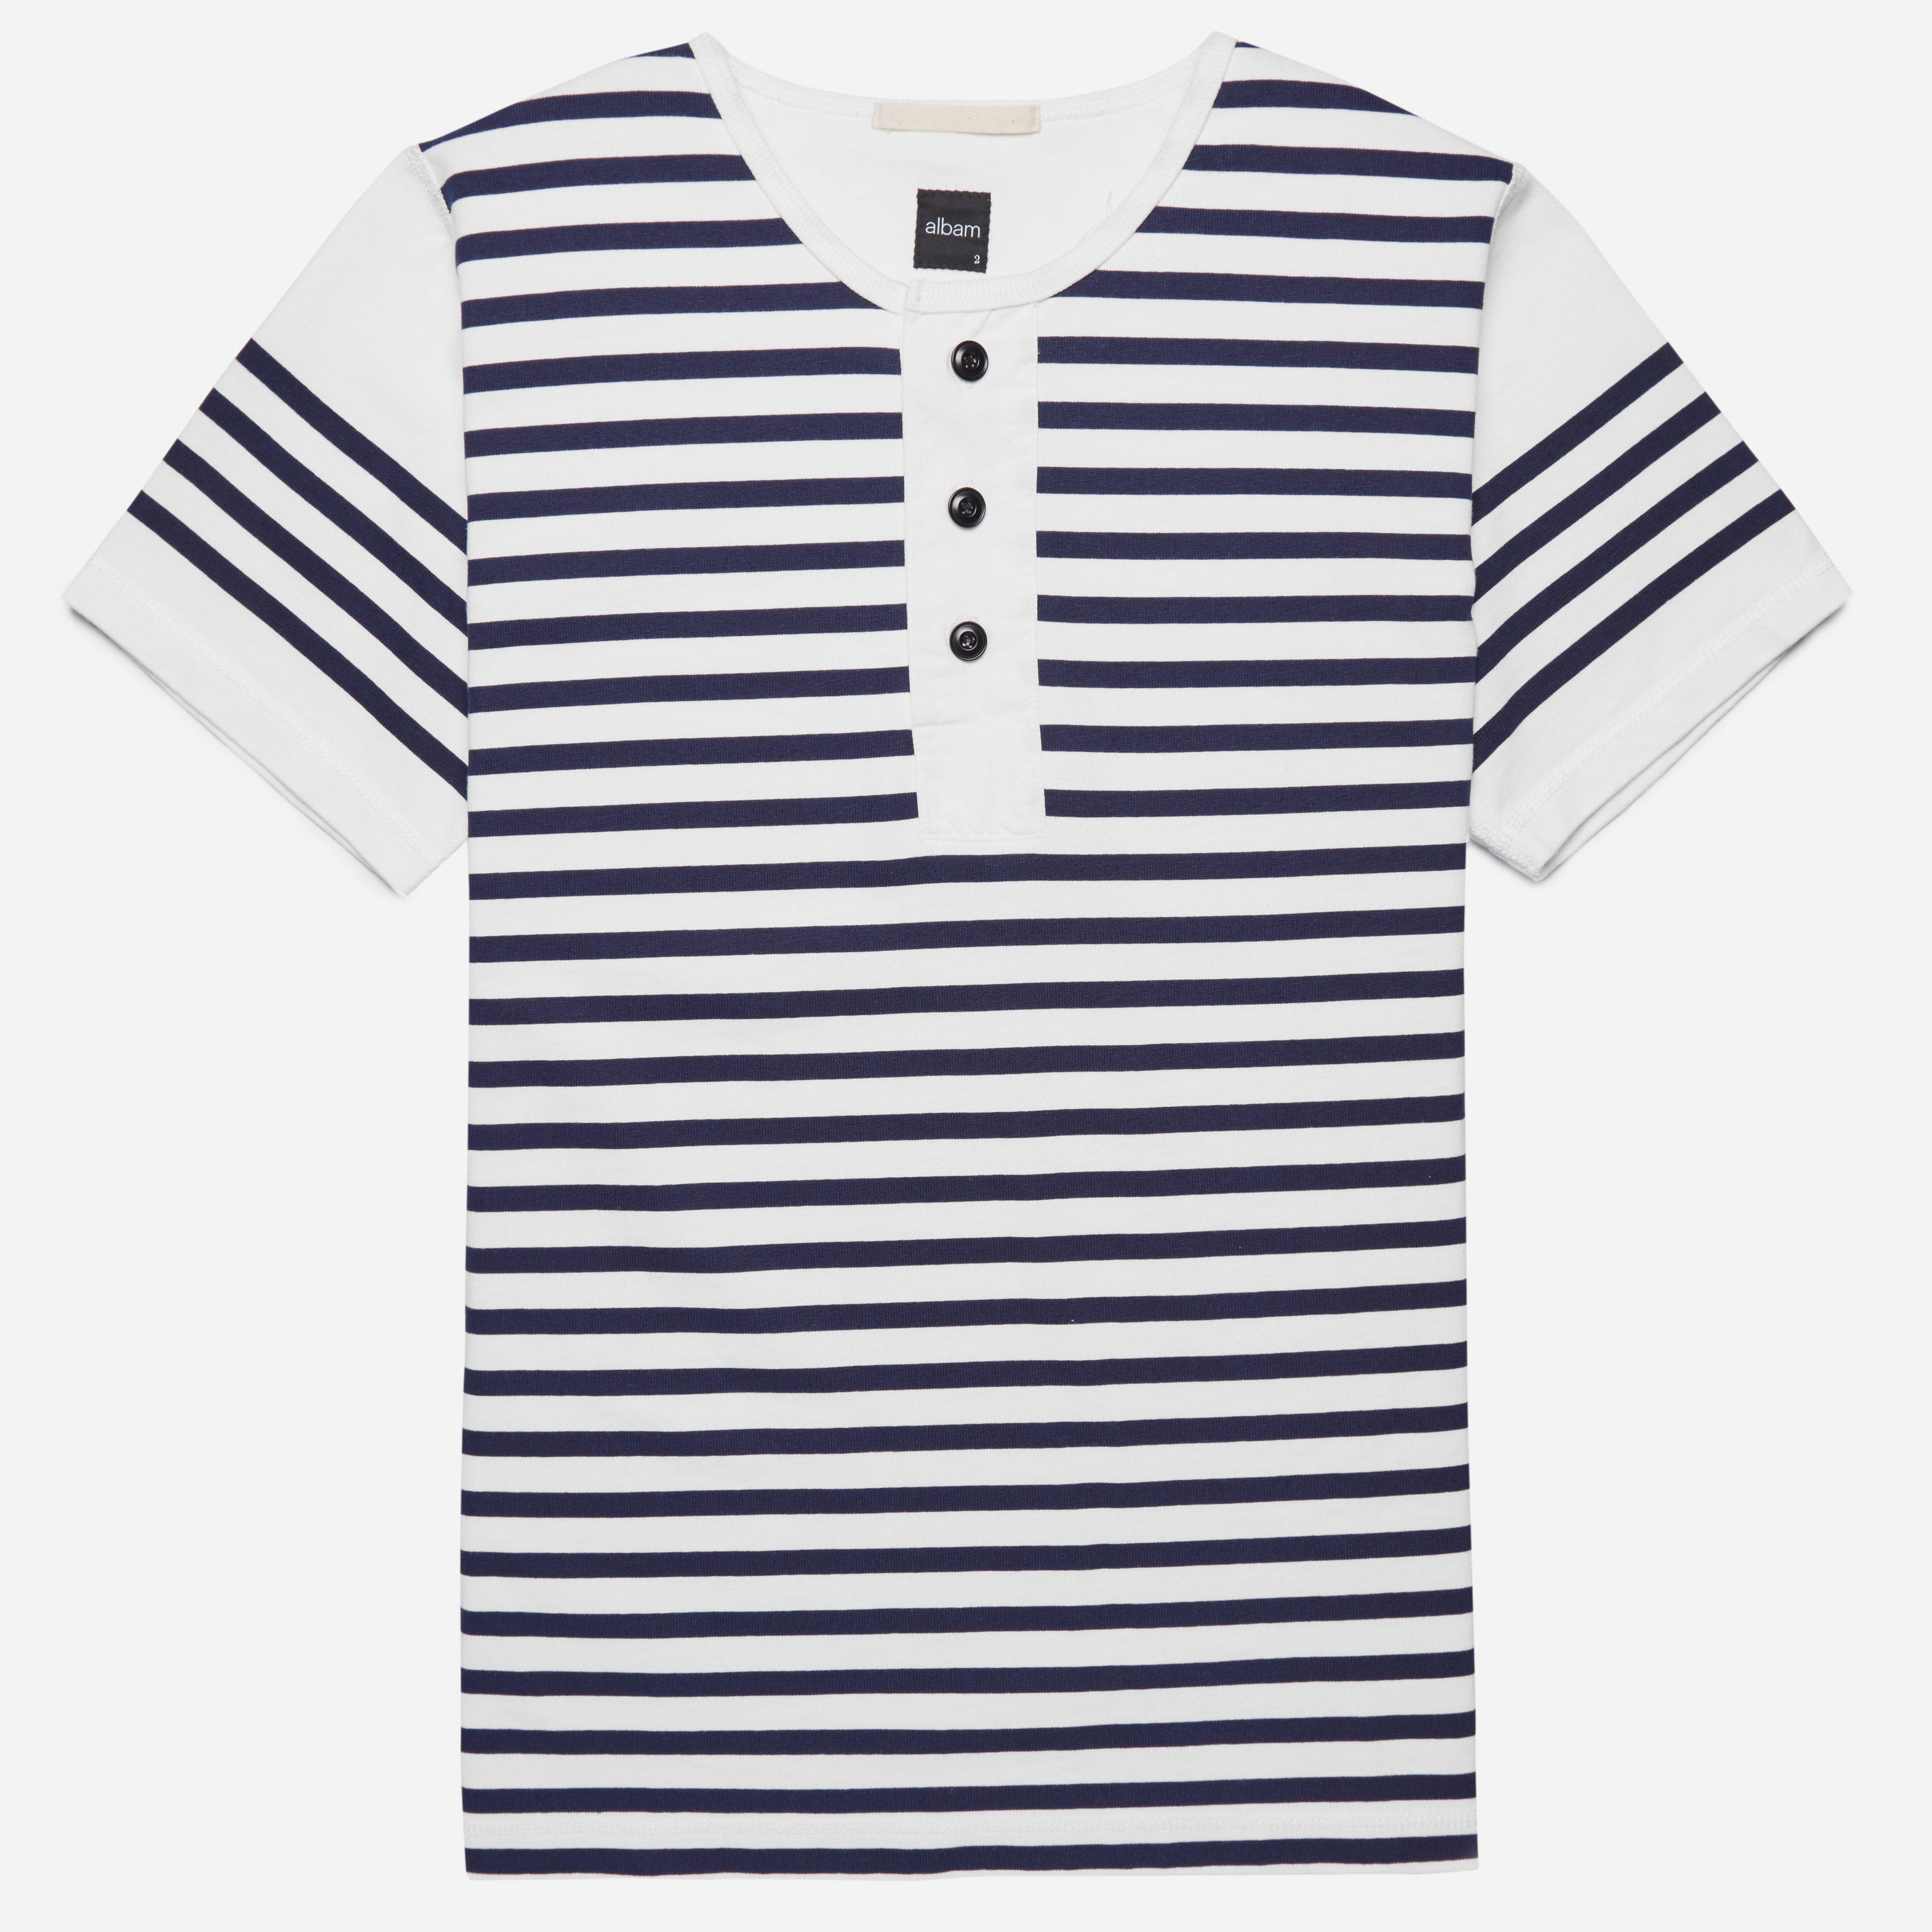 Albam Print Stripe Henley T-shirt